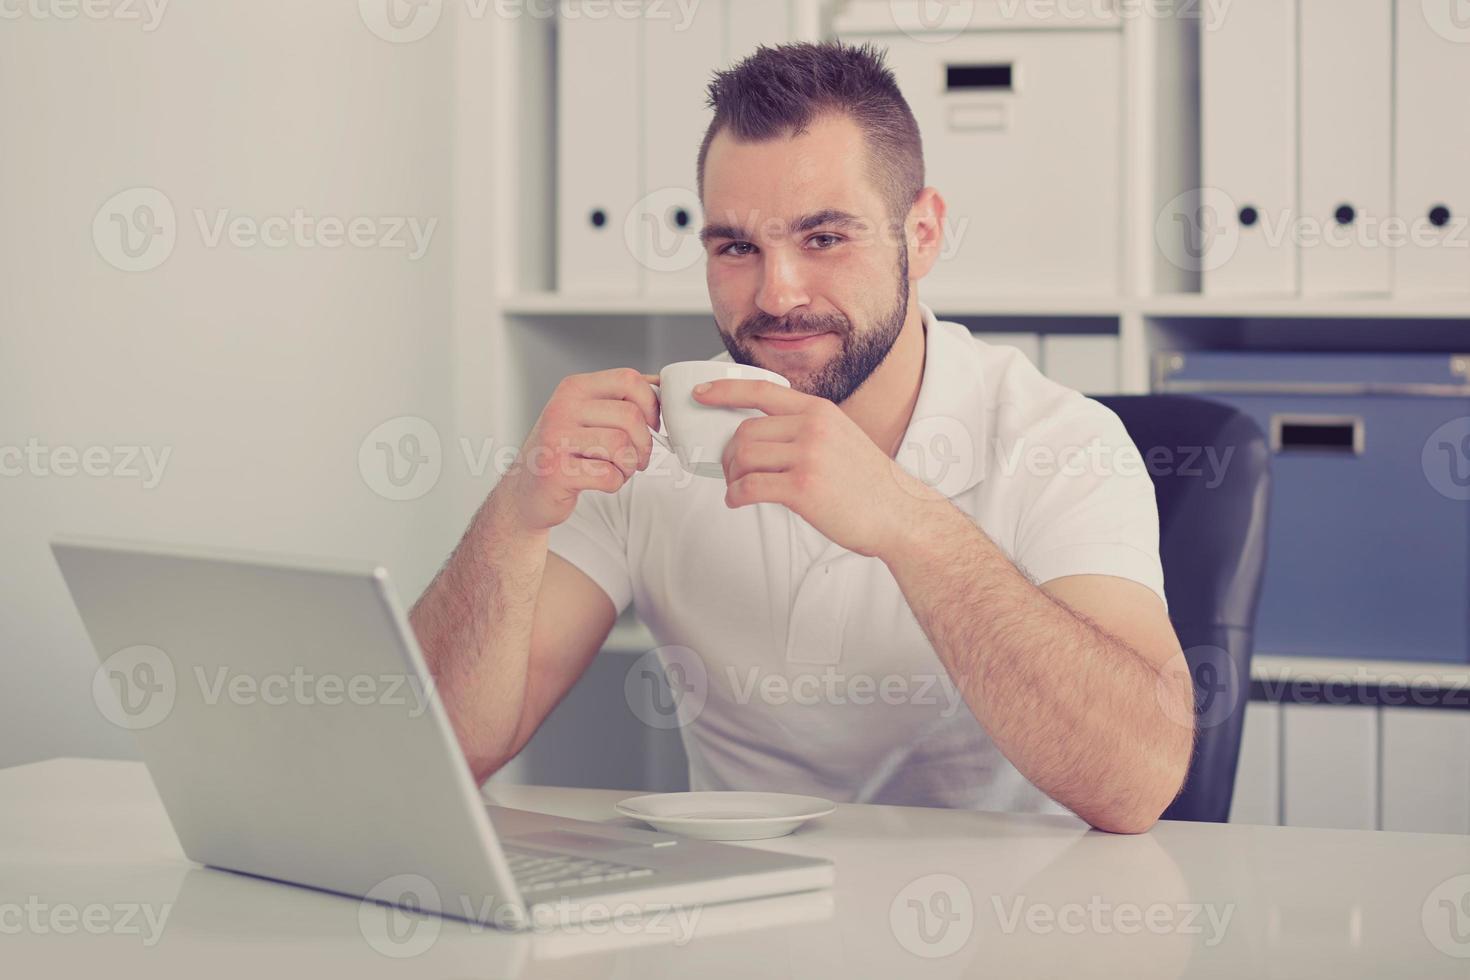 jonge zakenman koffie drinken, afgezwakt foto